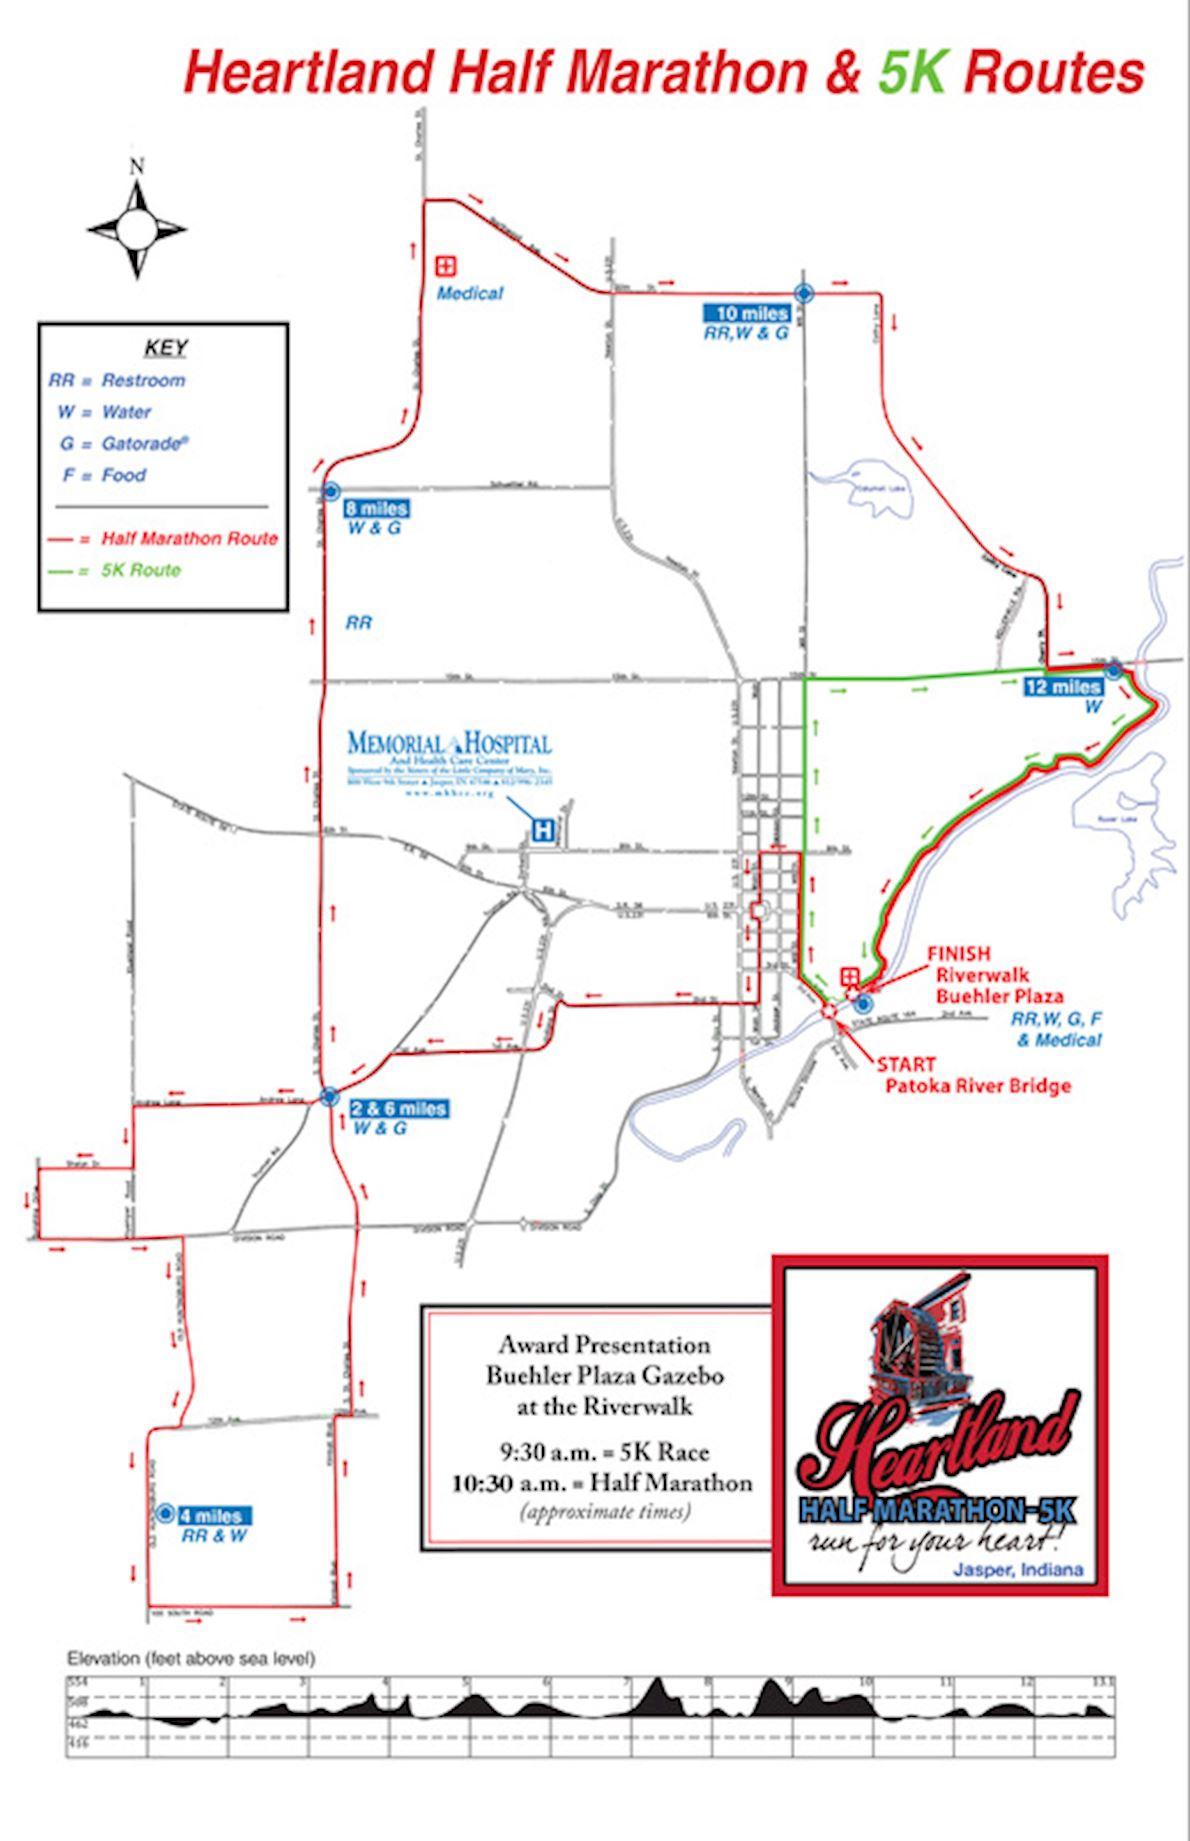 Heartland Half Marathon Route Map